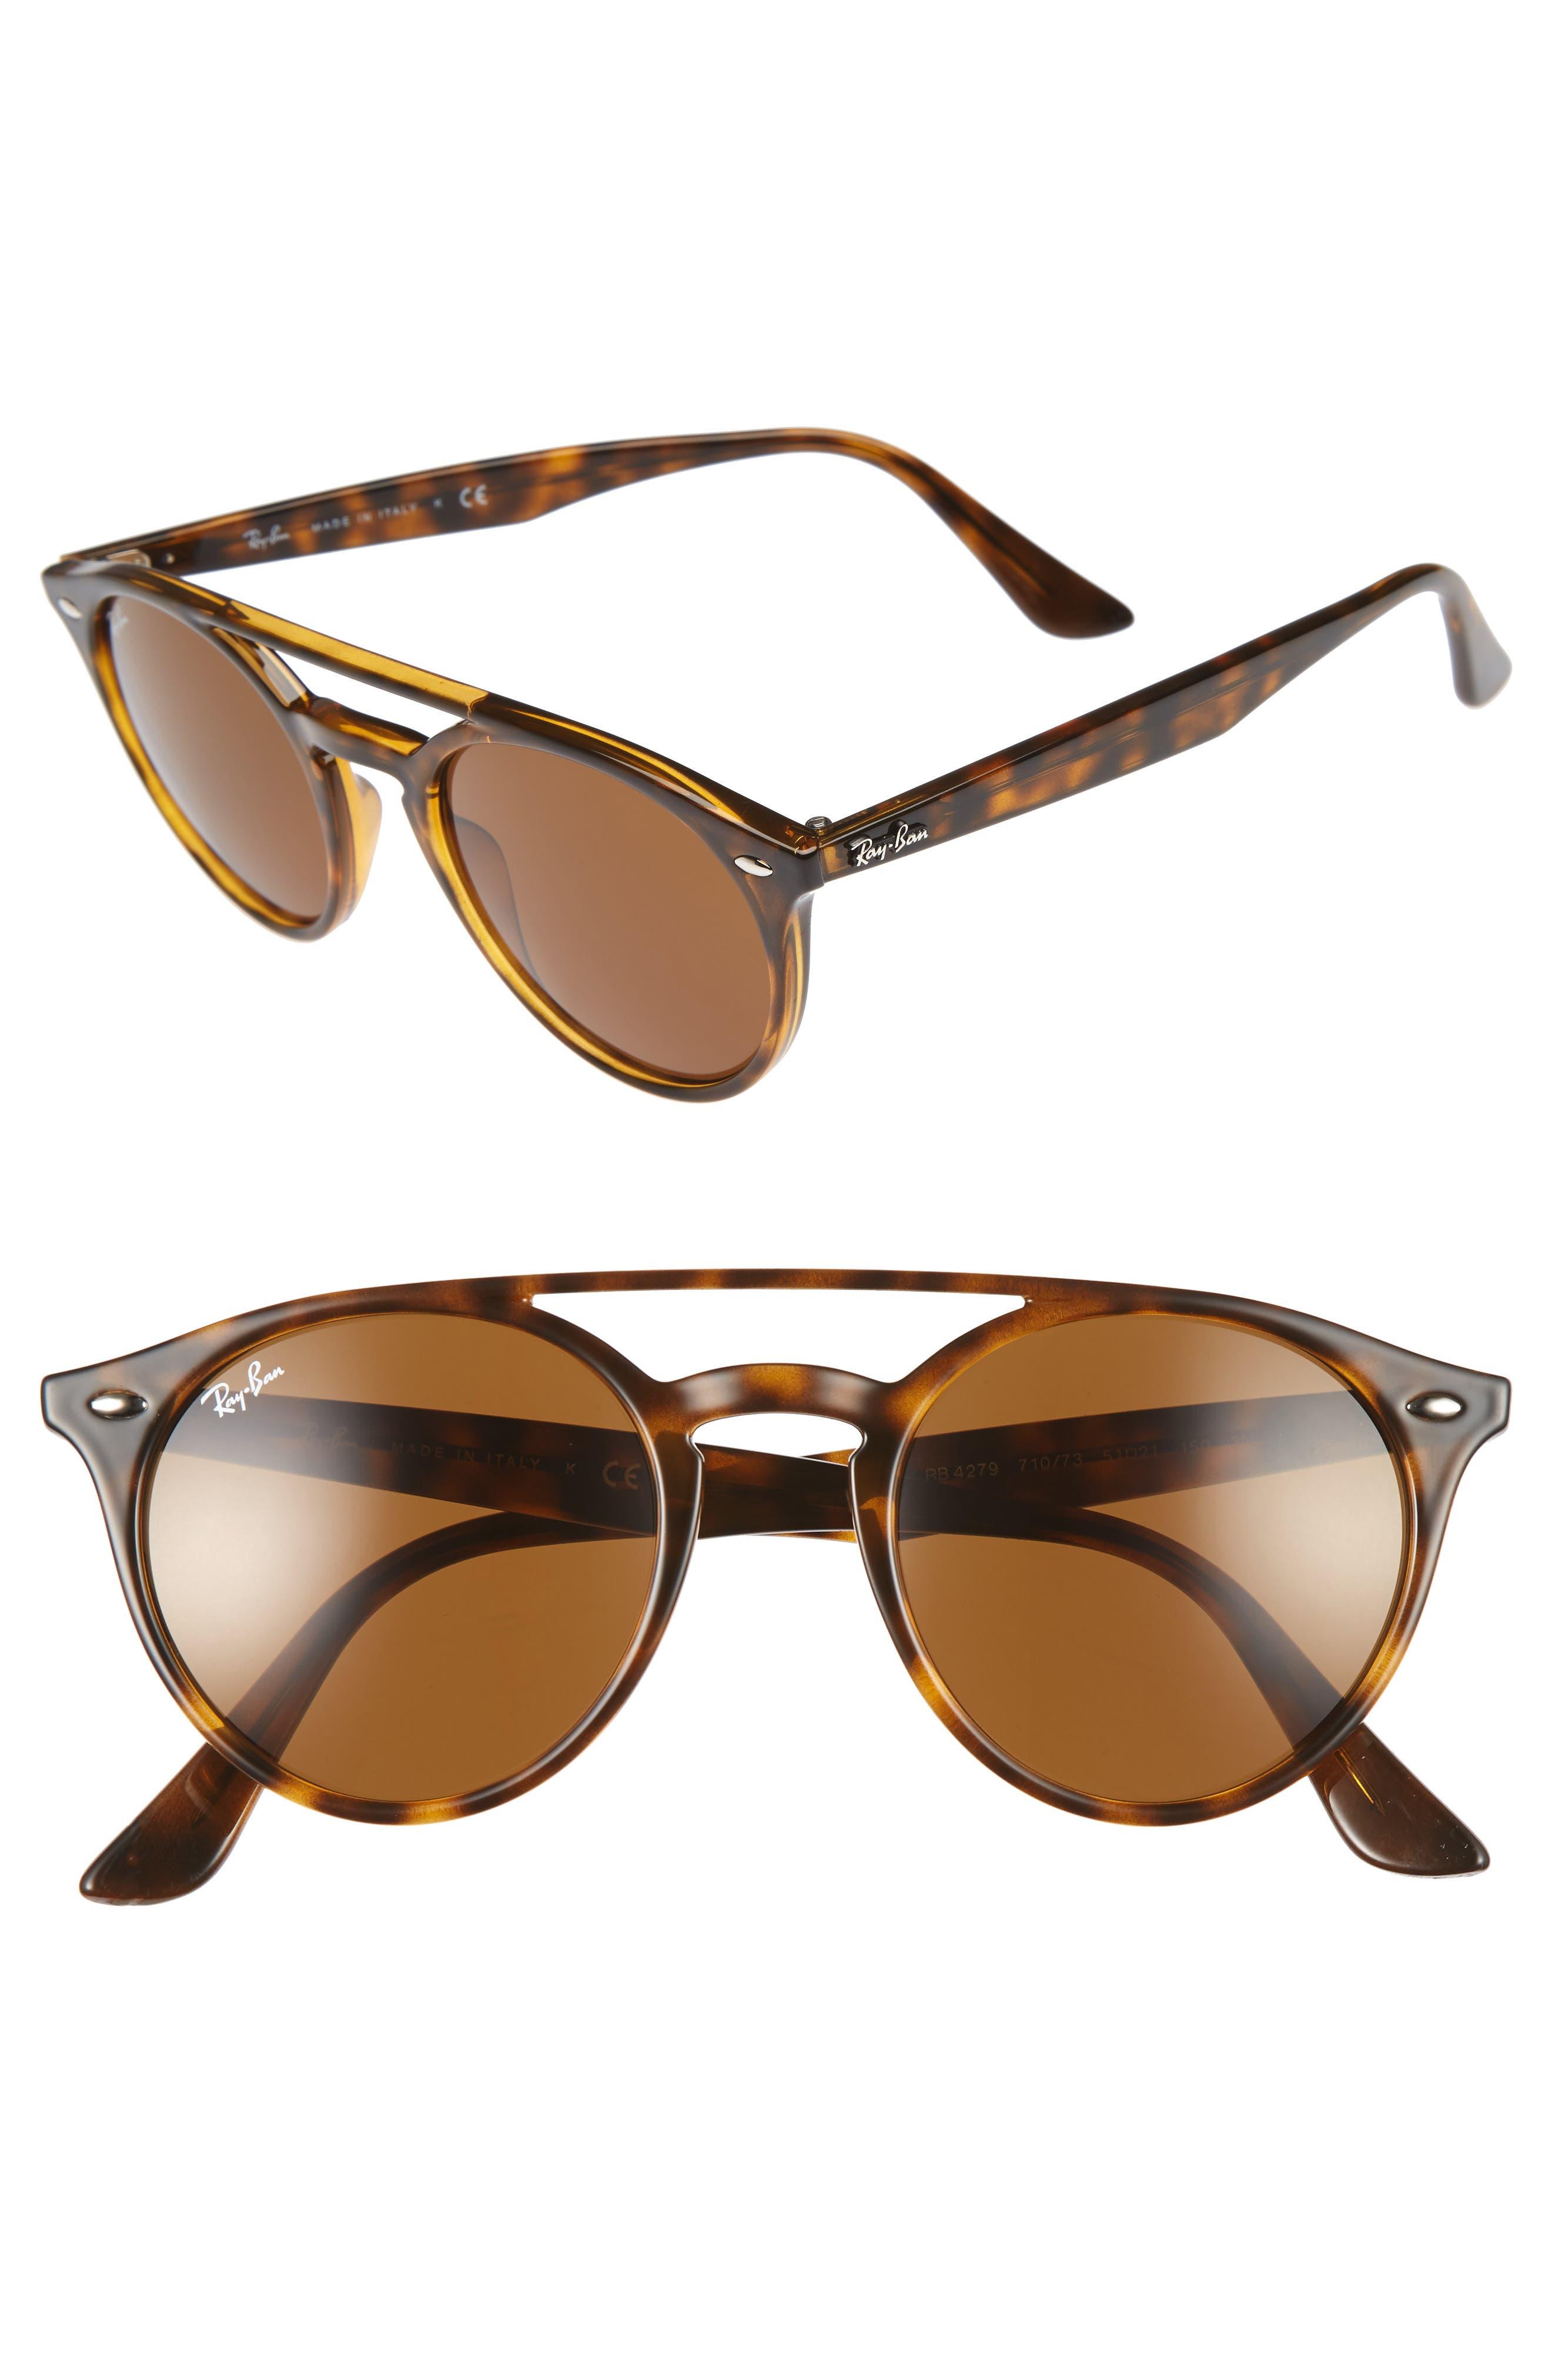 51mm Sunglasses,                             Main thumbnail 1, color,                             200